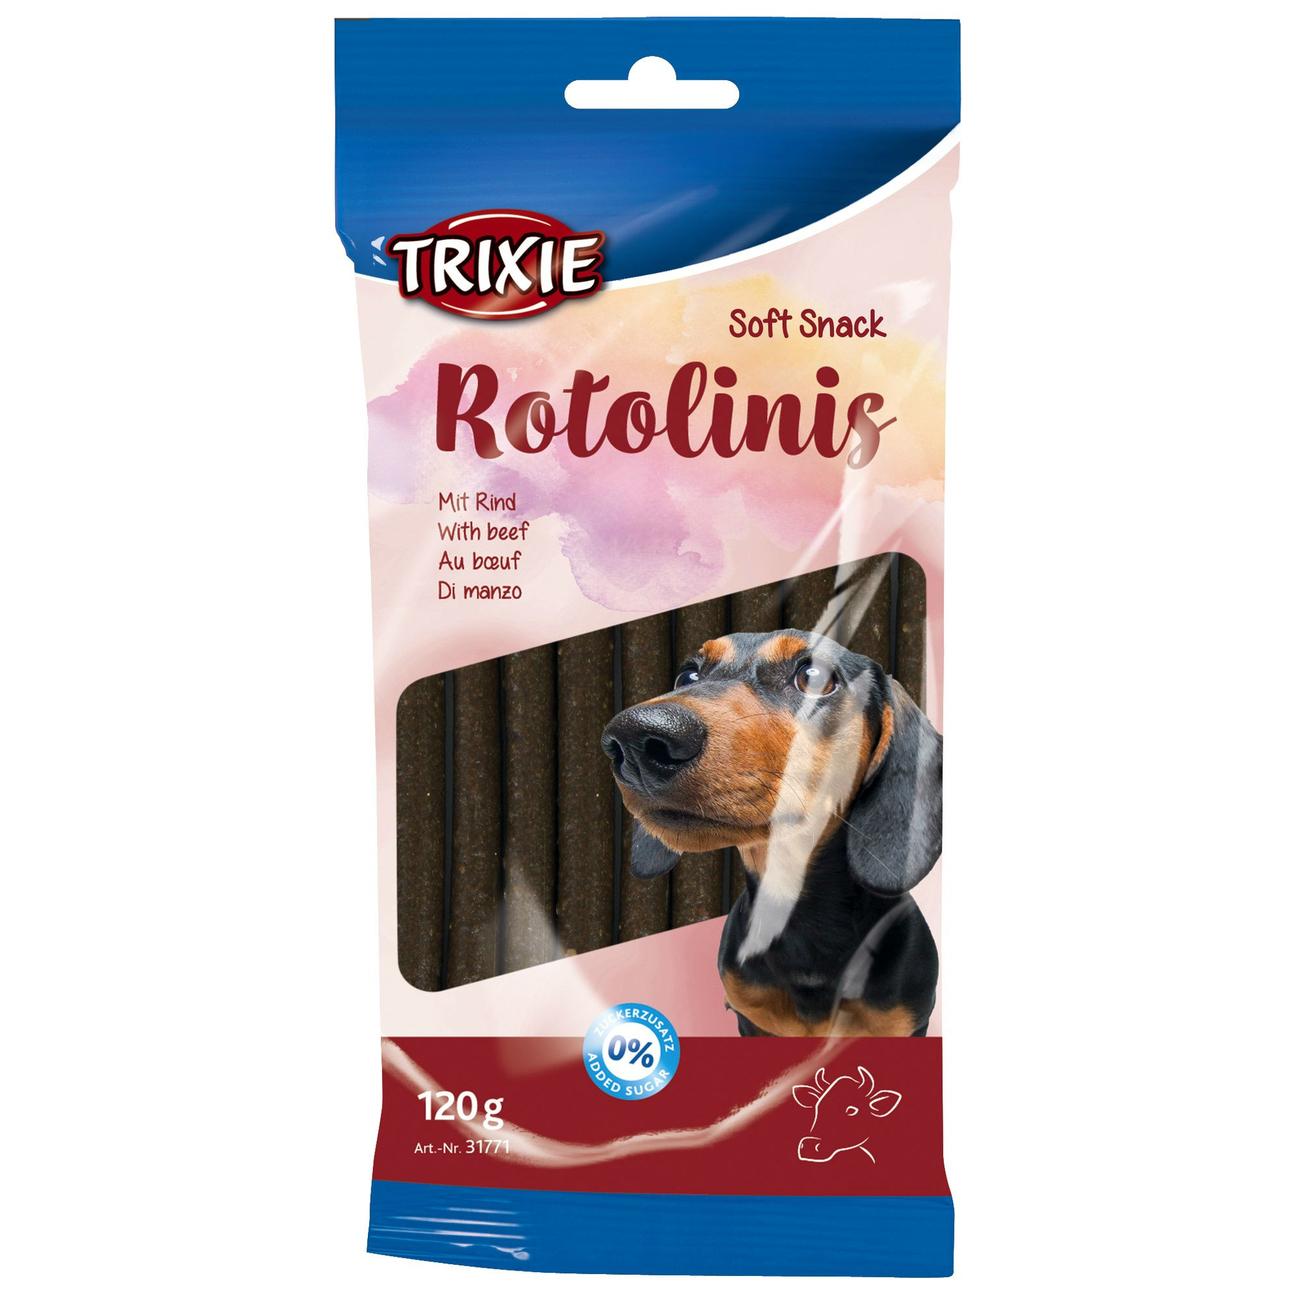 Trixie Kaustangen Hund Rotolinis 3171, Bild 3